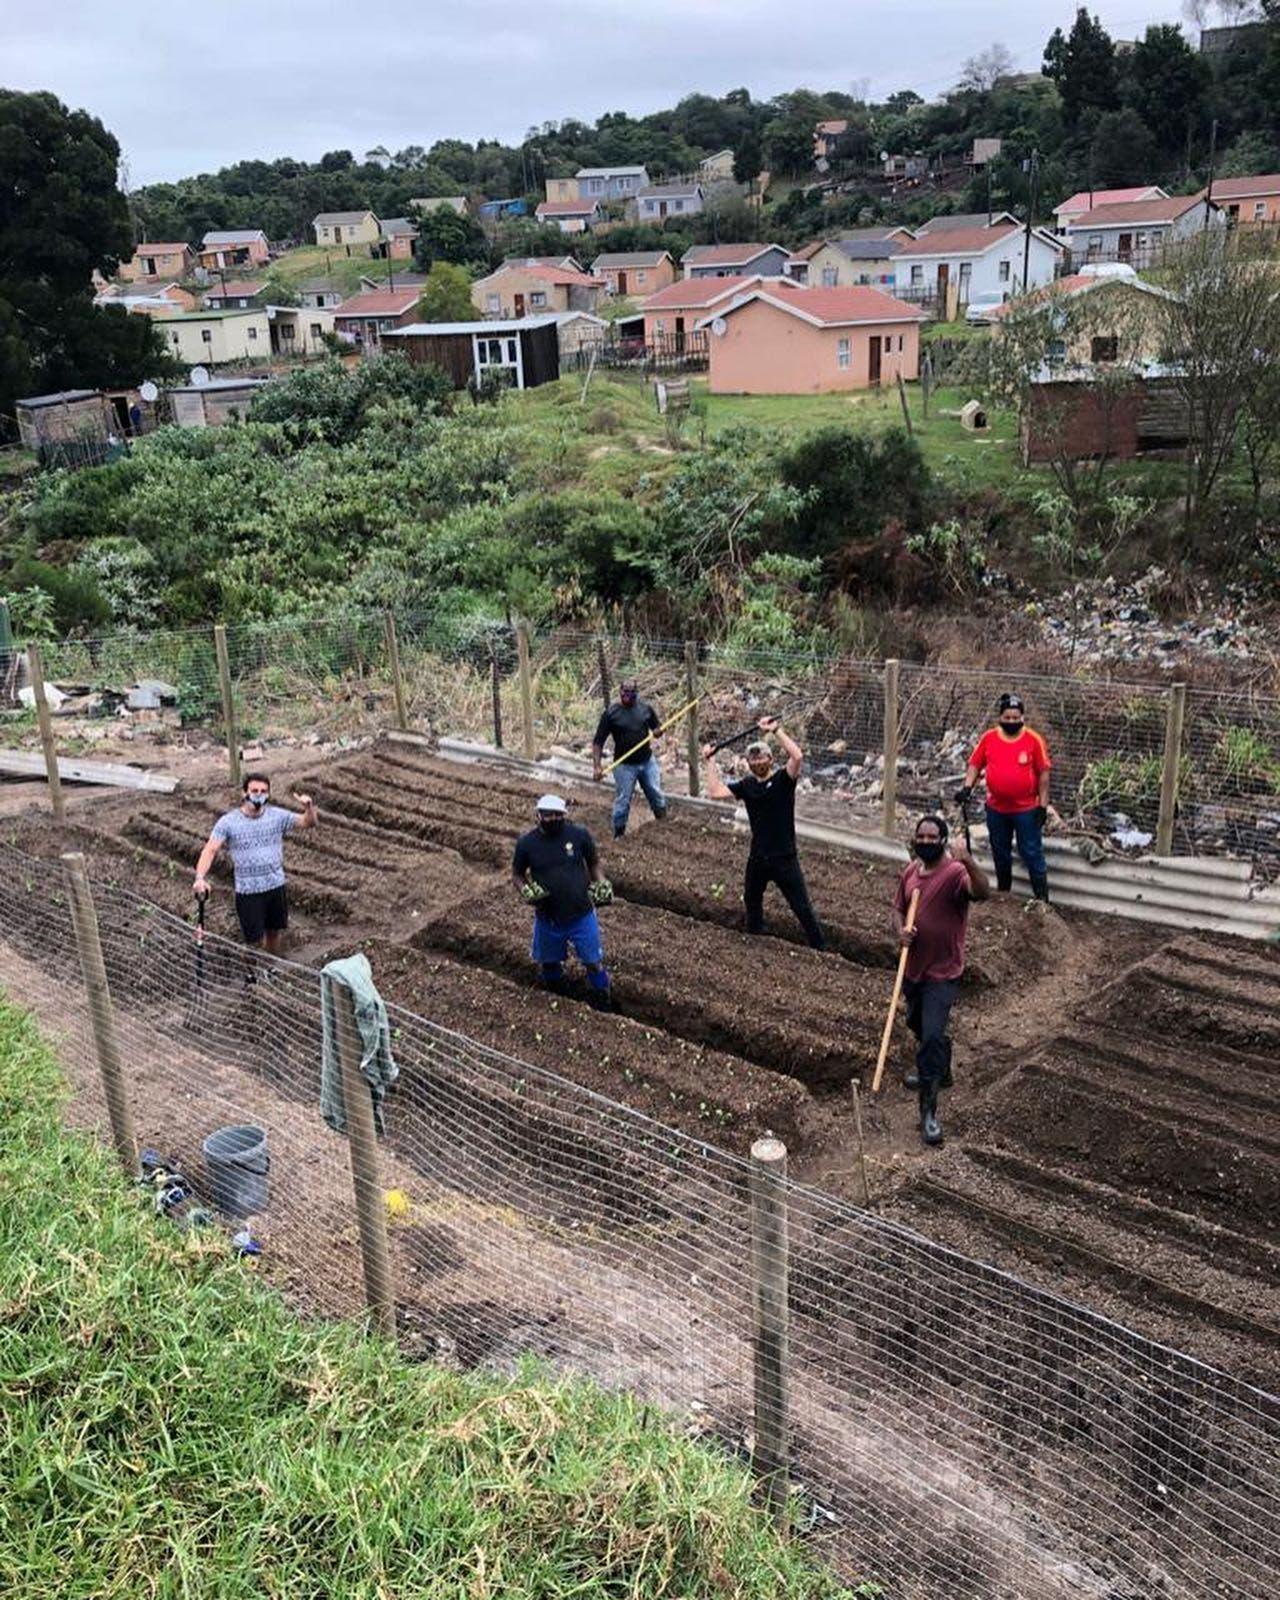 knysna vegetable garden garbage dump south africa